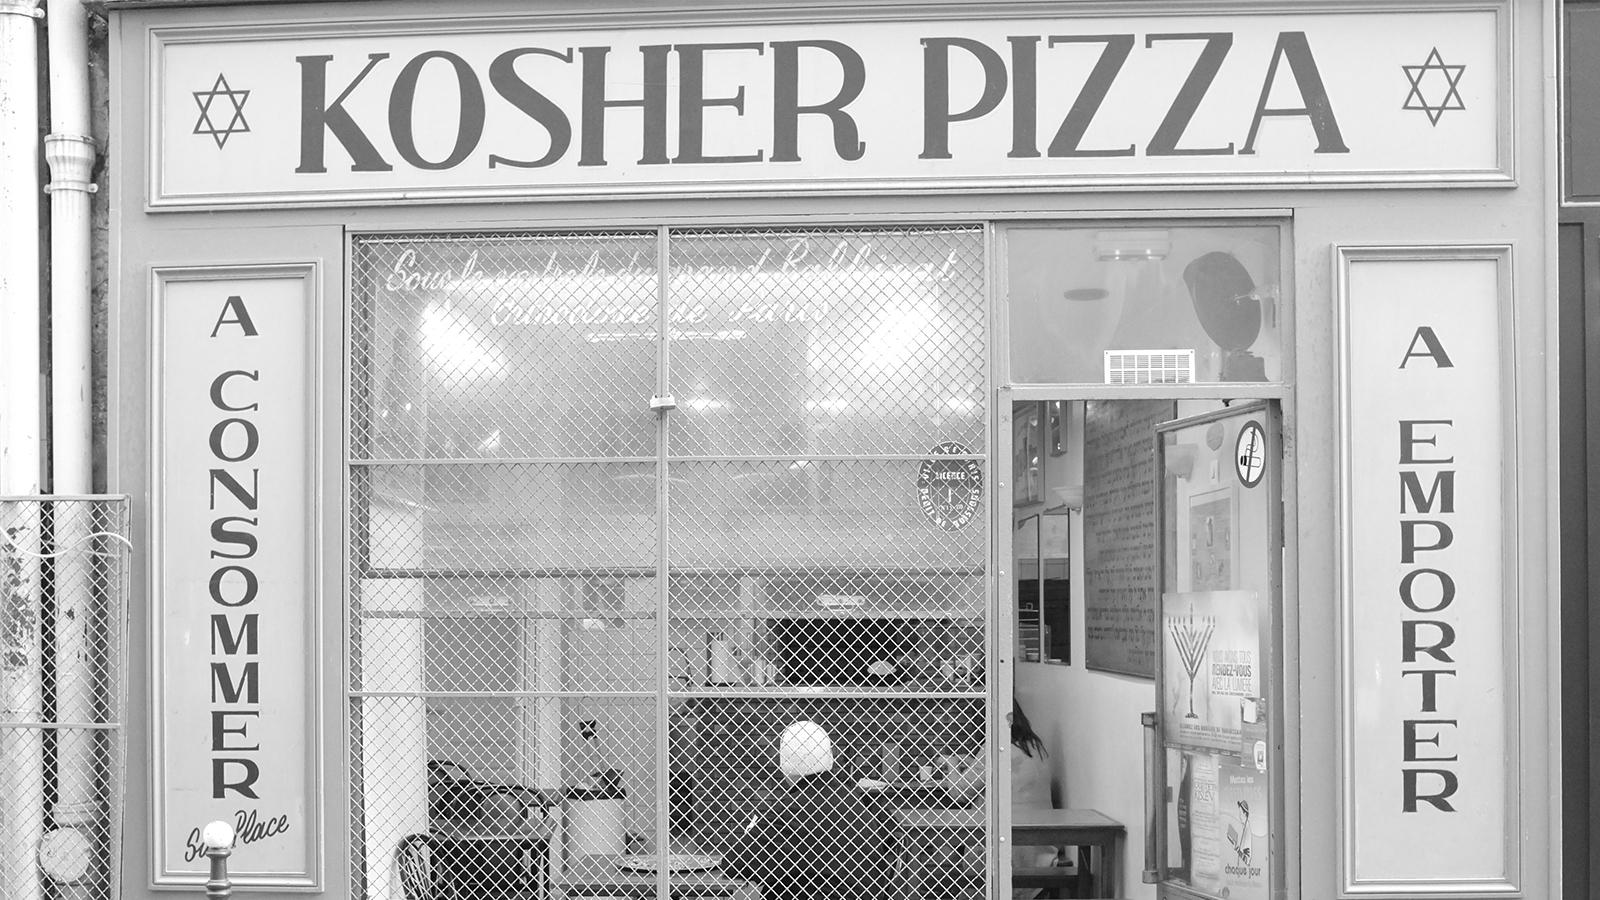 Kosher Pizza place